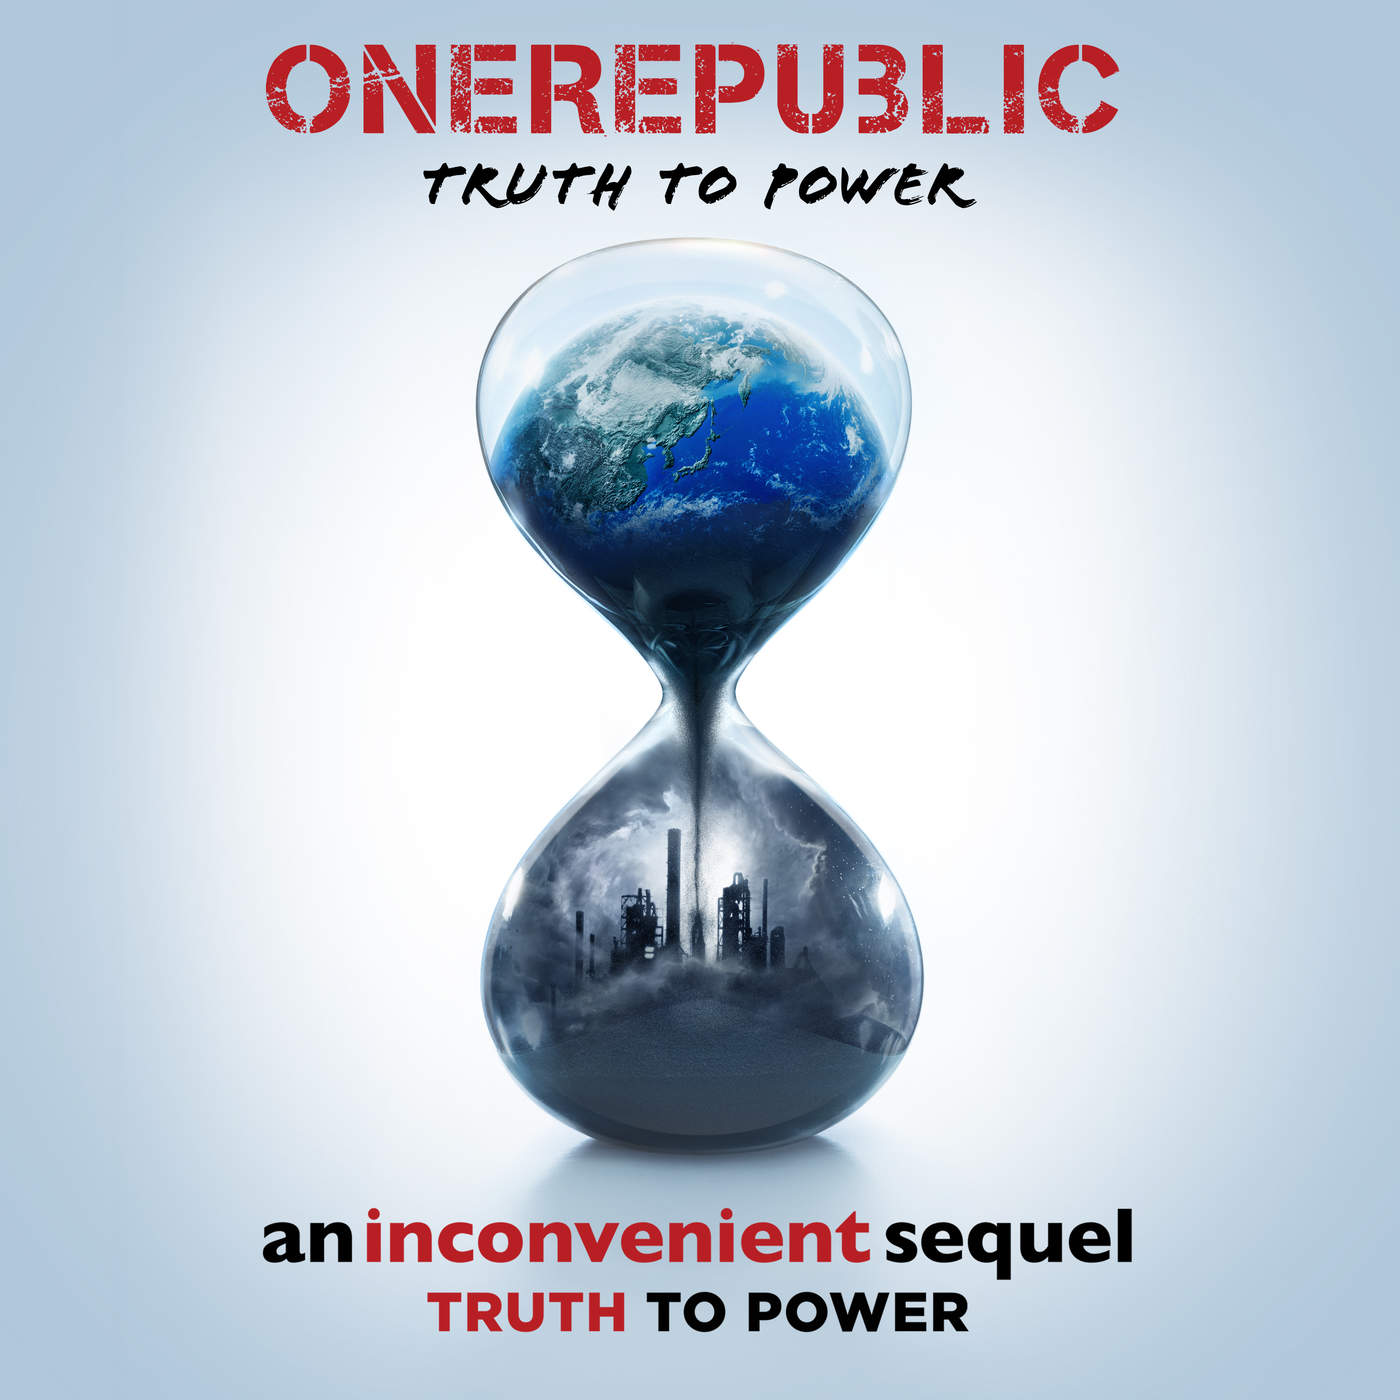 OneRepublic - Truth To Power - Single Cover